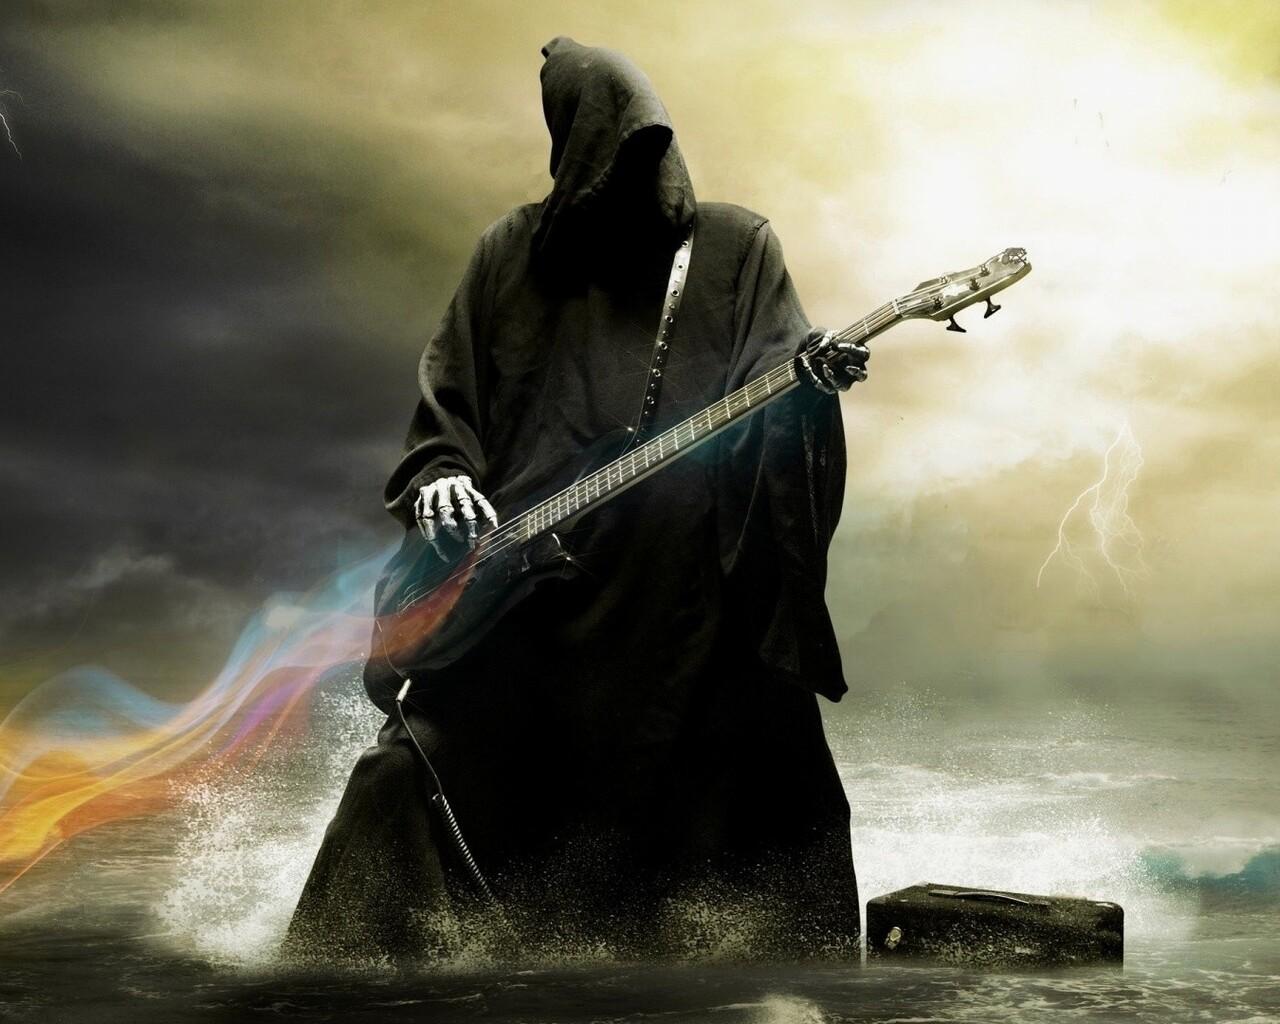 grim-reaper-playing-guitar-qhd.jpg